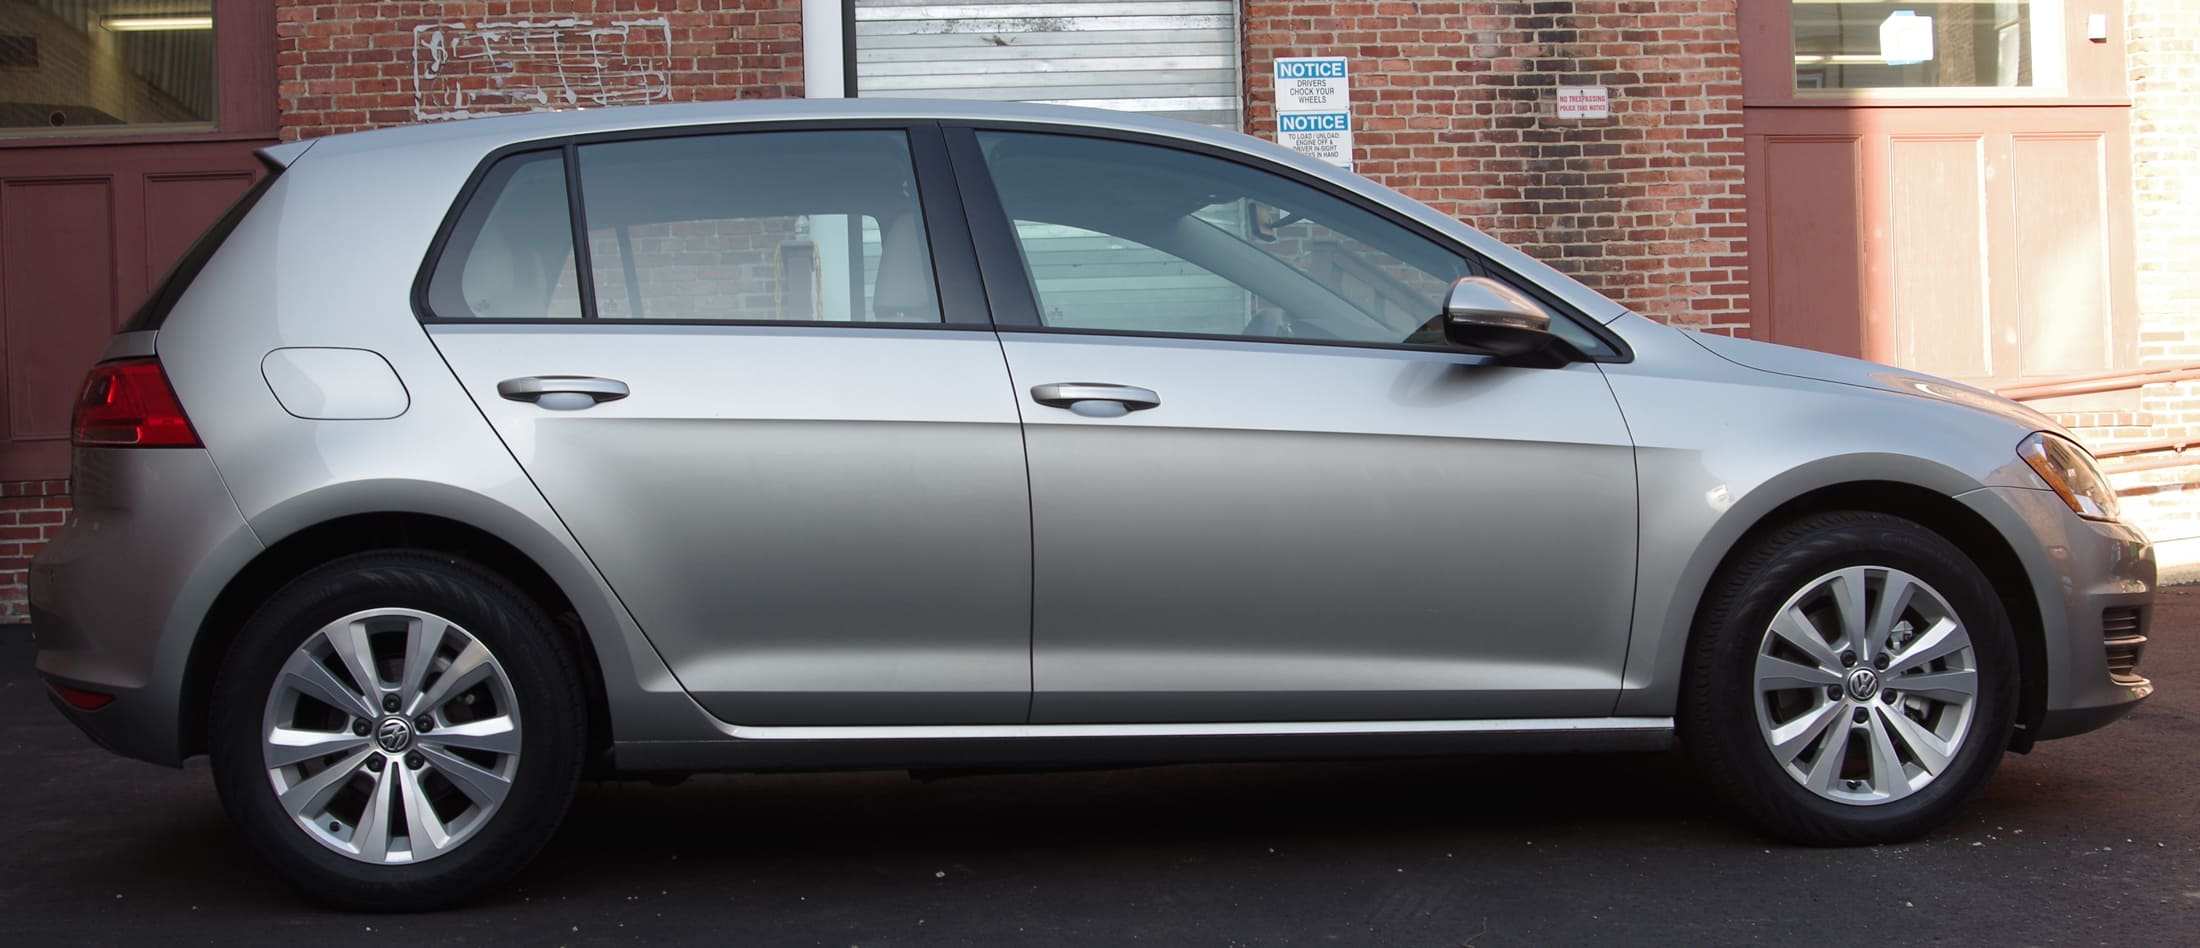 2015 VW Golf side